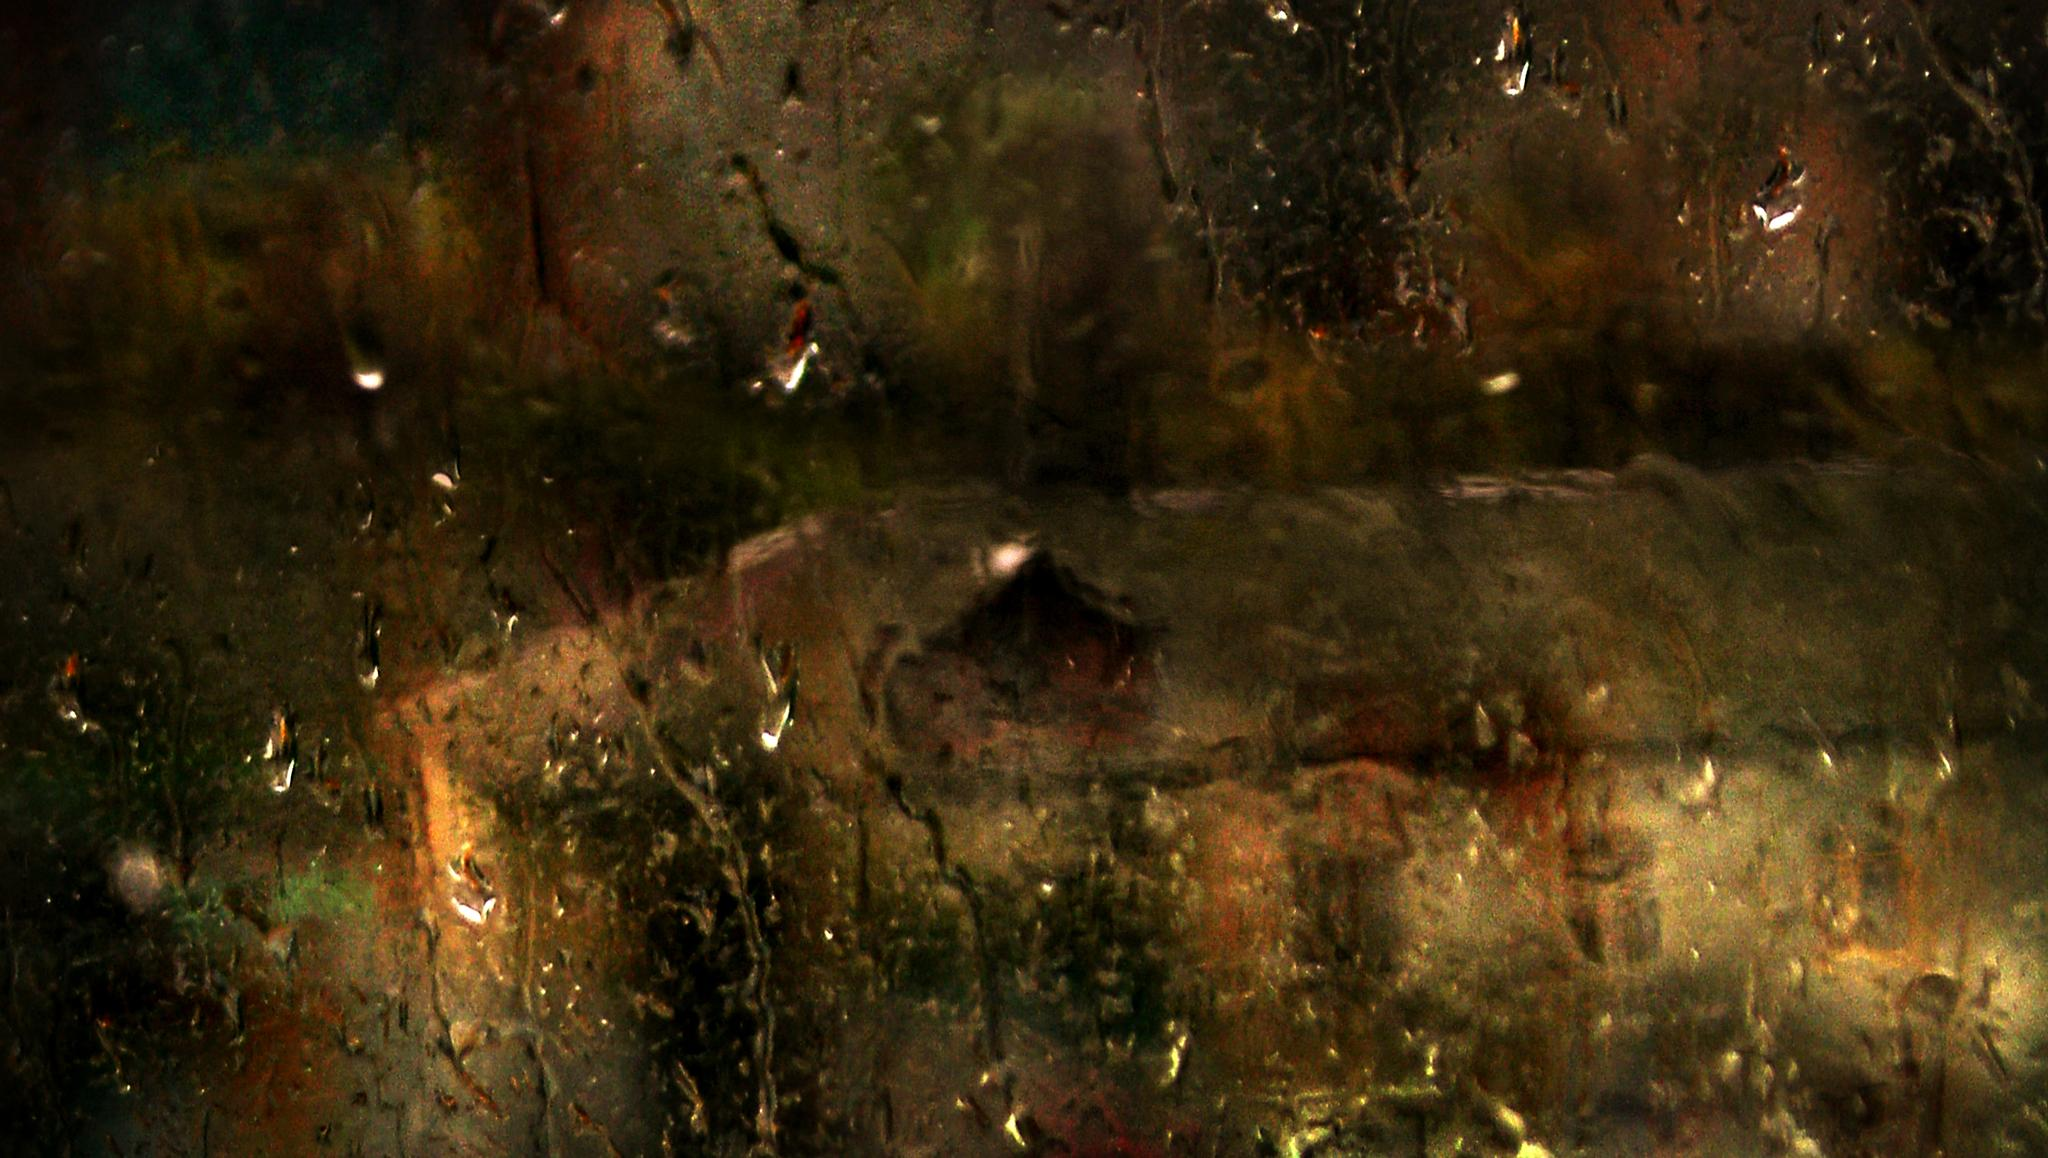 Rain time by Сергей Юрьев